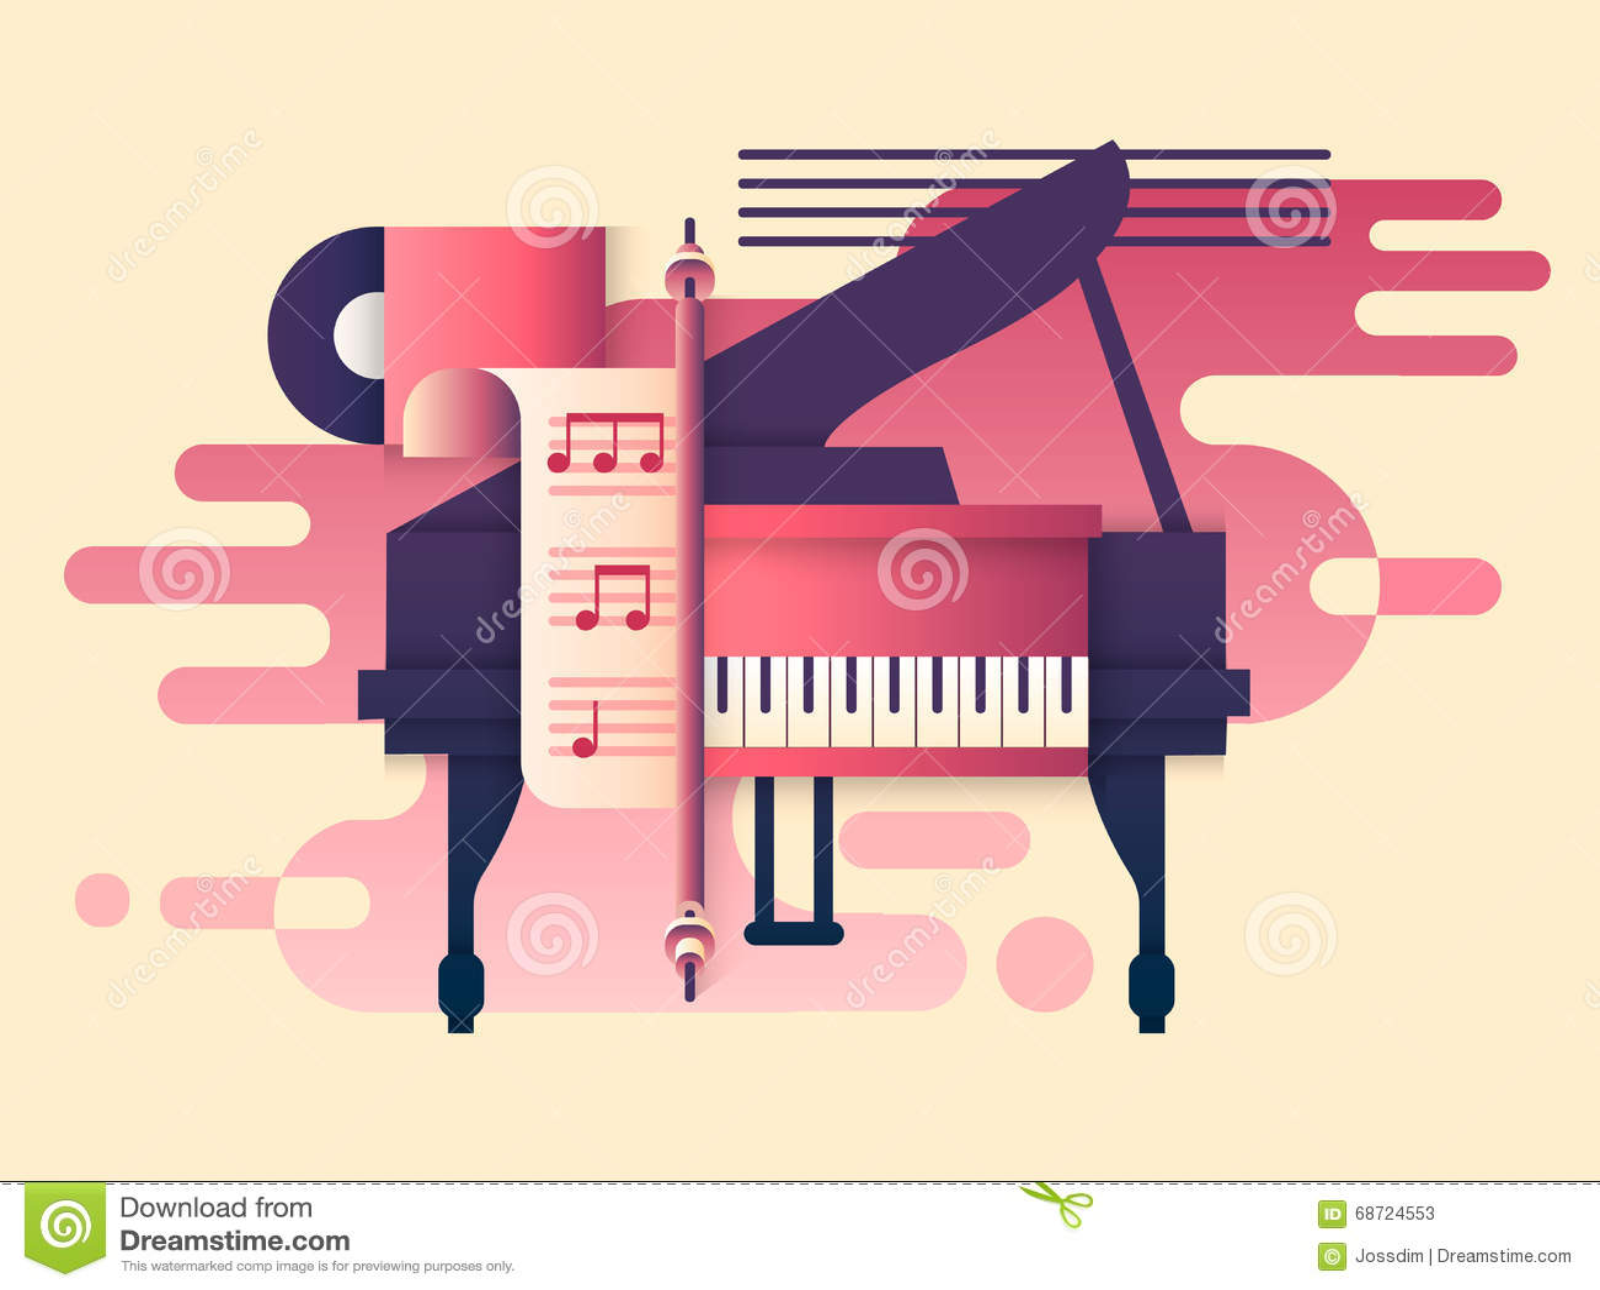 Download Piano Design Flat Stock Vector Illustration Of Instrumental